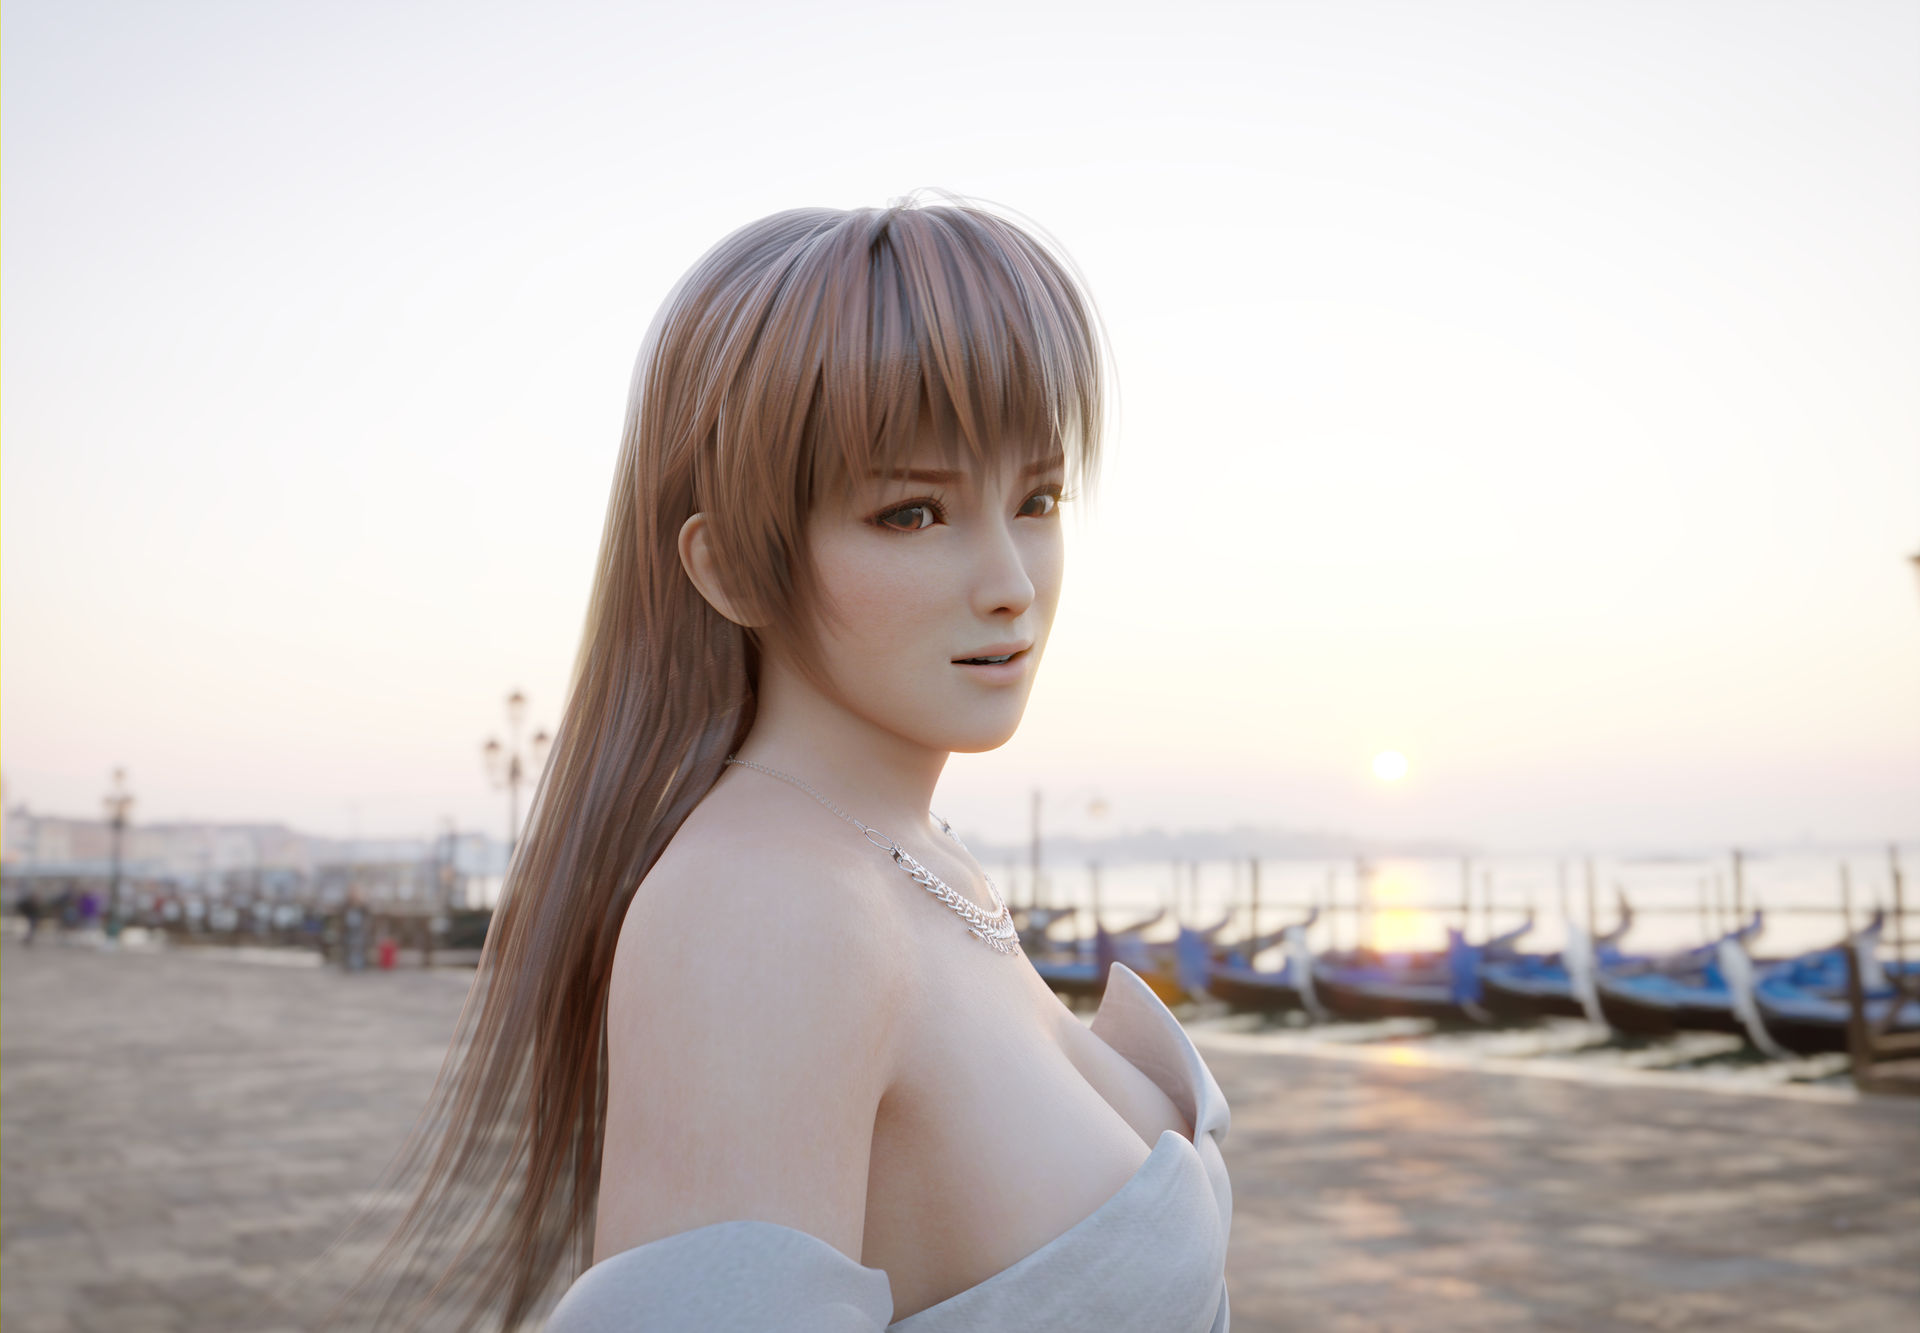 Kasumi Photoshoot 15 - Wedding by Nodern03